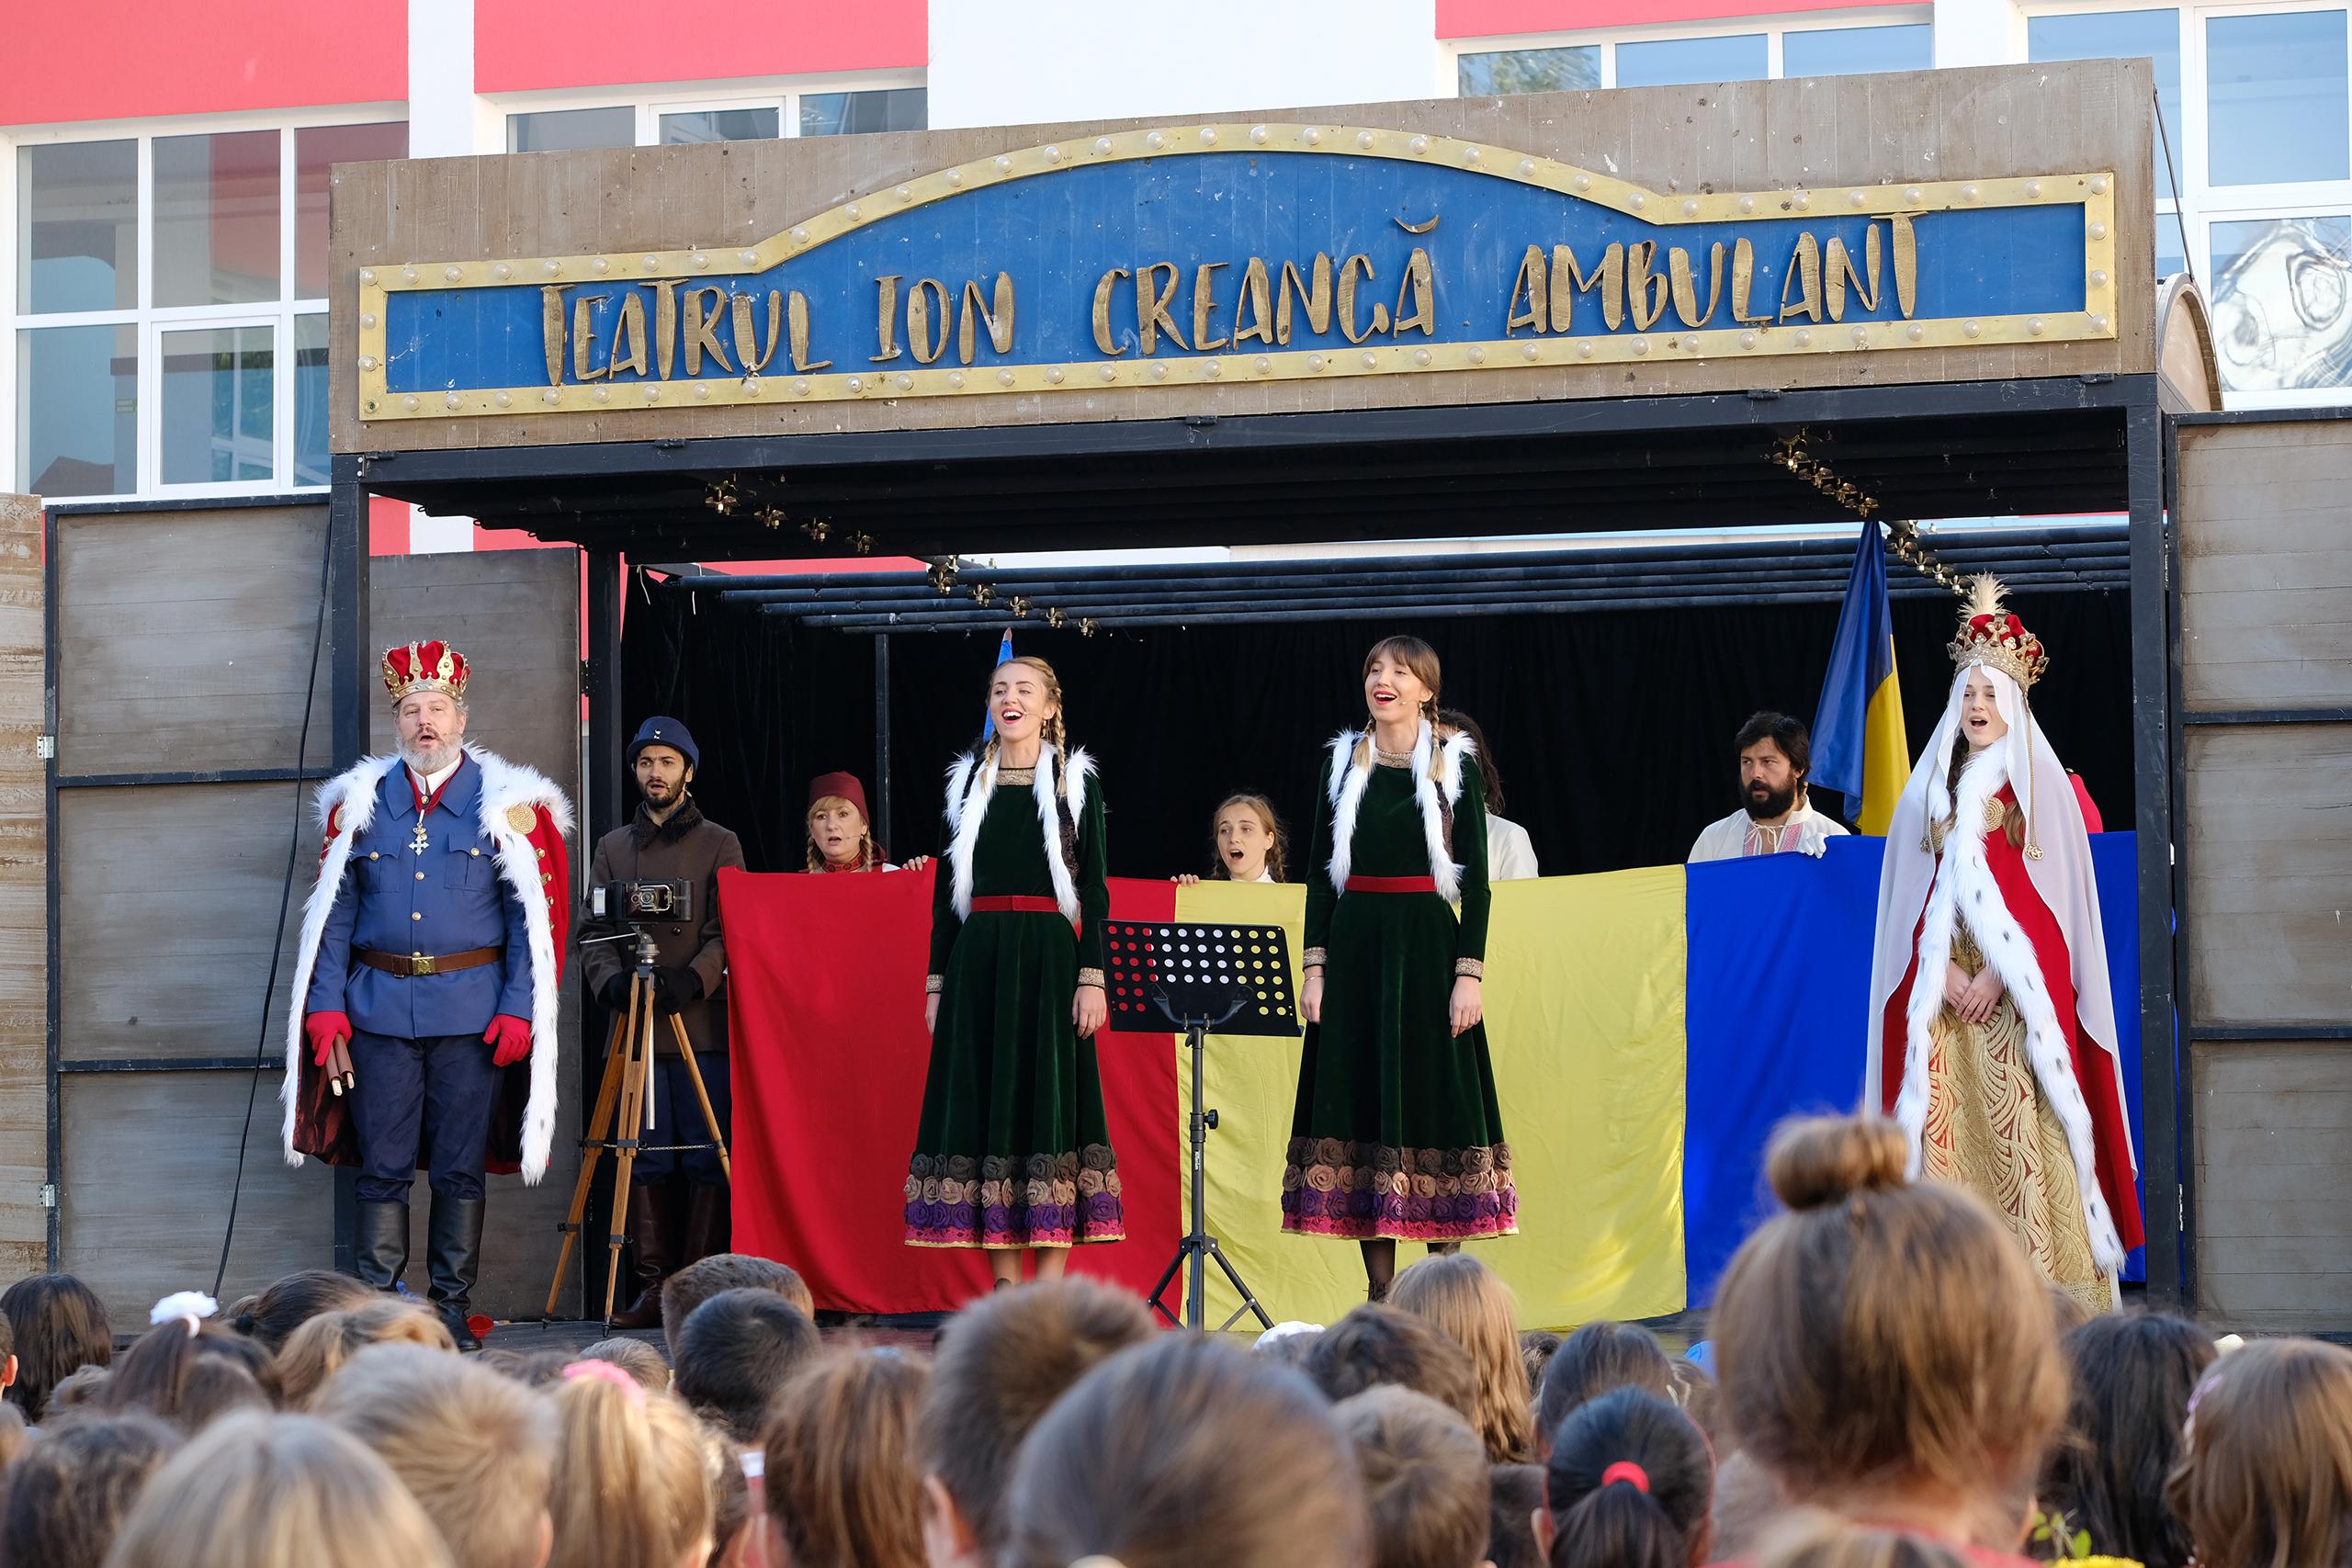 Spectacol Centenar_Romania dodoloata 1